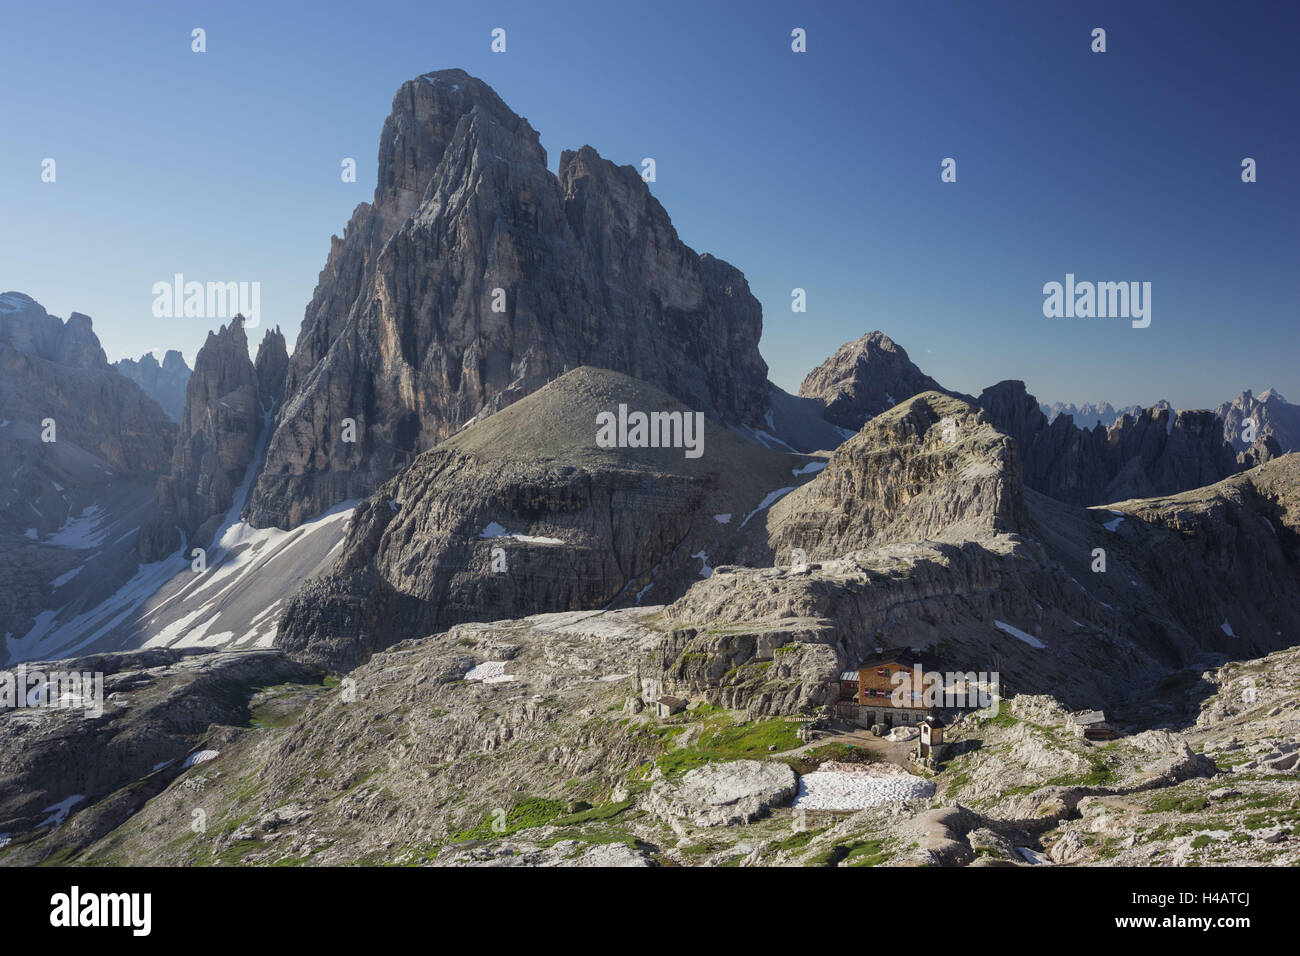 Zwölferkofel, Büllele yoke hut, South Tyrol, the Dolomites mountains, Italy - Stock Image